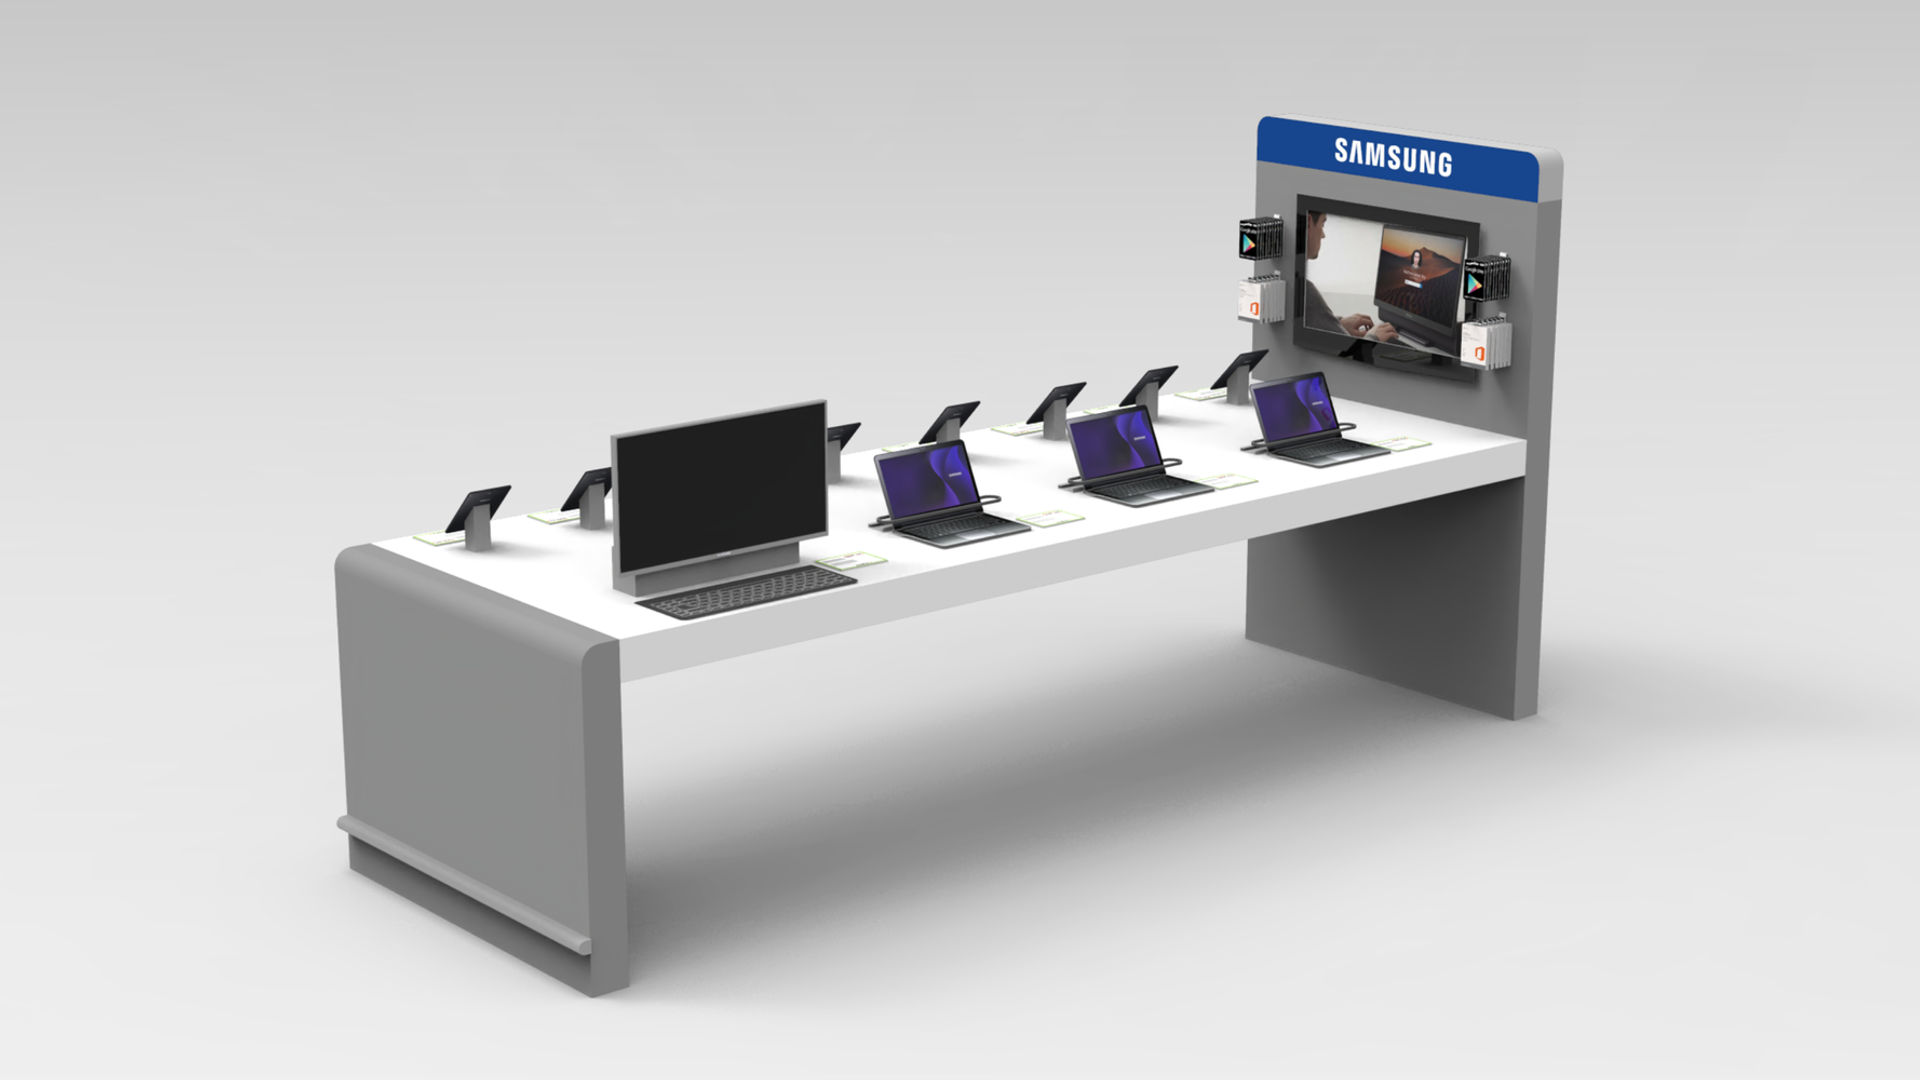 Samsung Computer Display